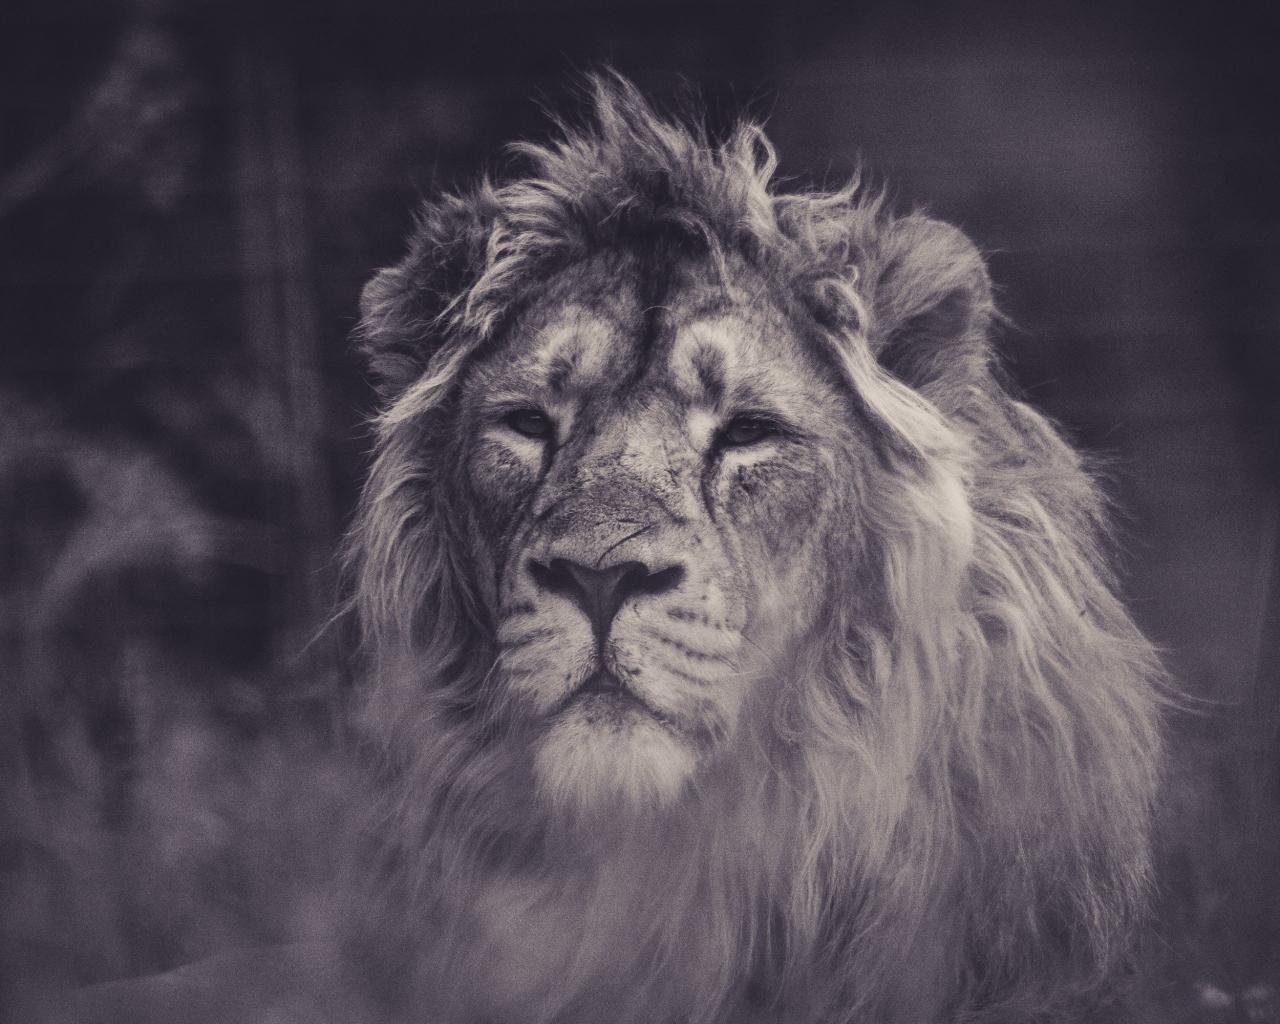 Lion, calm, predator, muzzle, 1280x1024 wallpaper